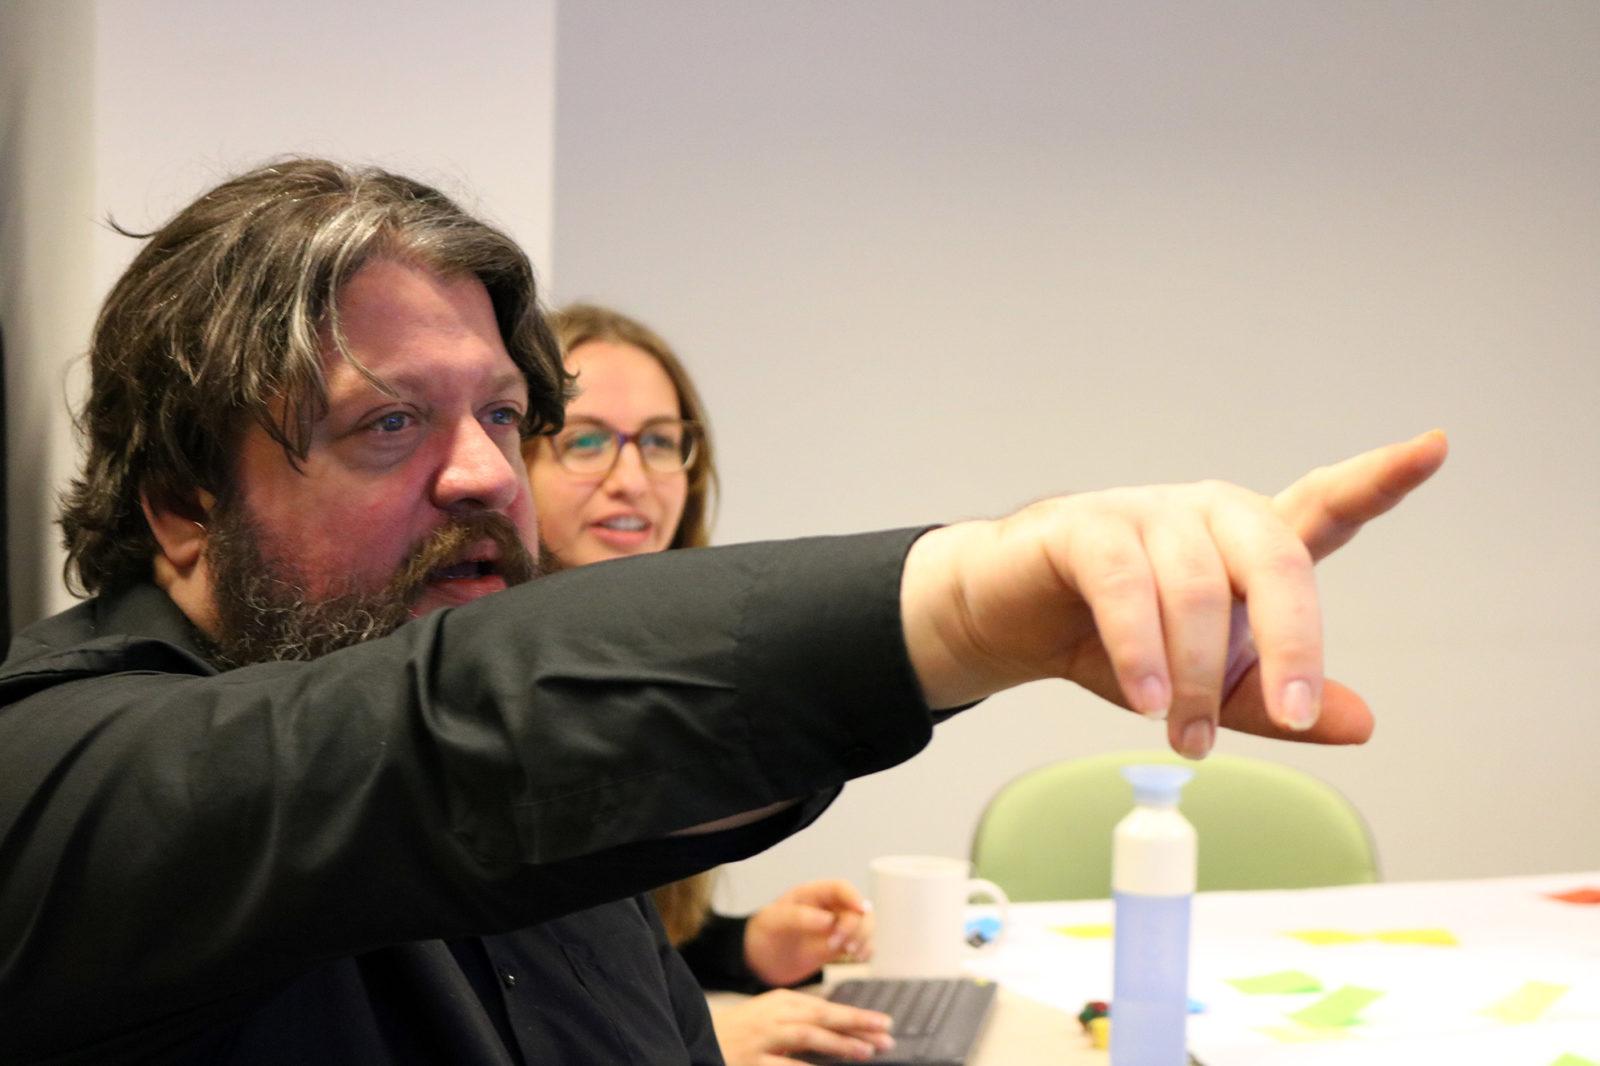 storyboarding-mooc-philosophy-of-science-tim-de-mey-romy-van-leeuwen